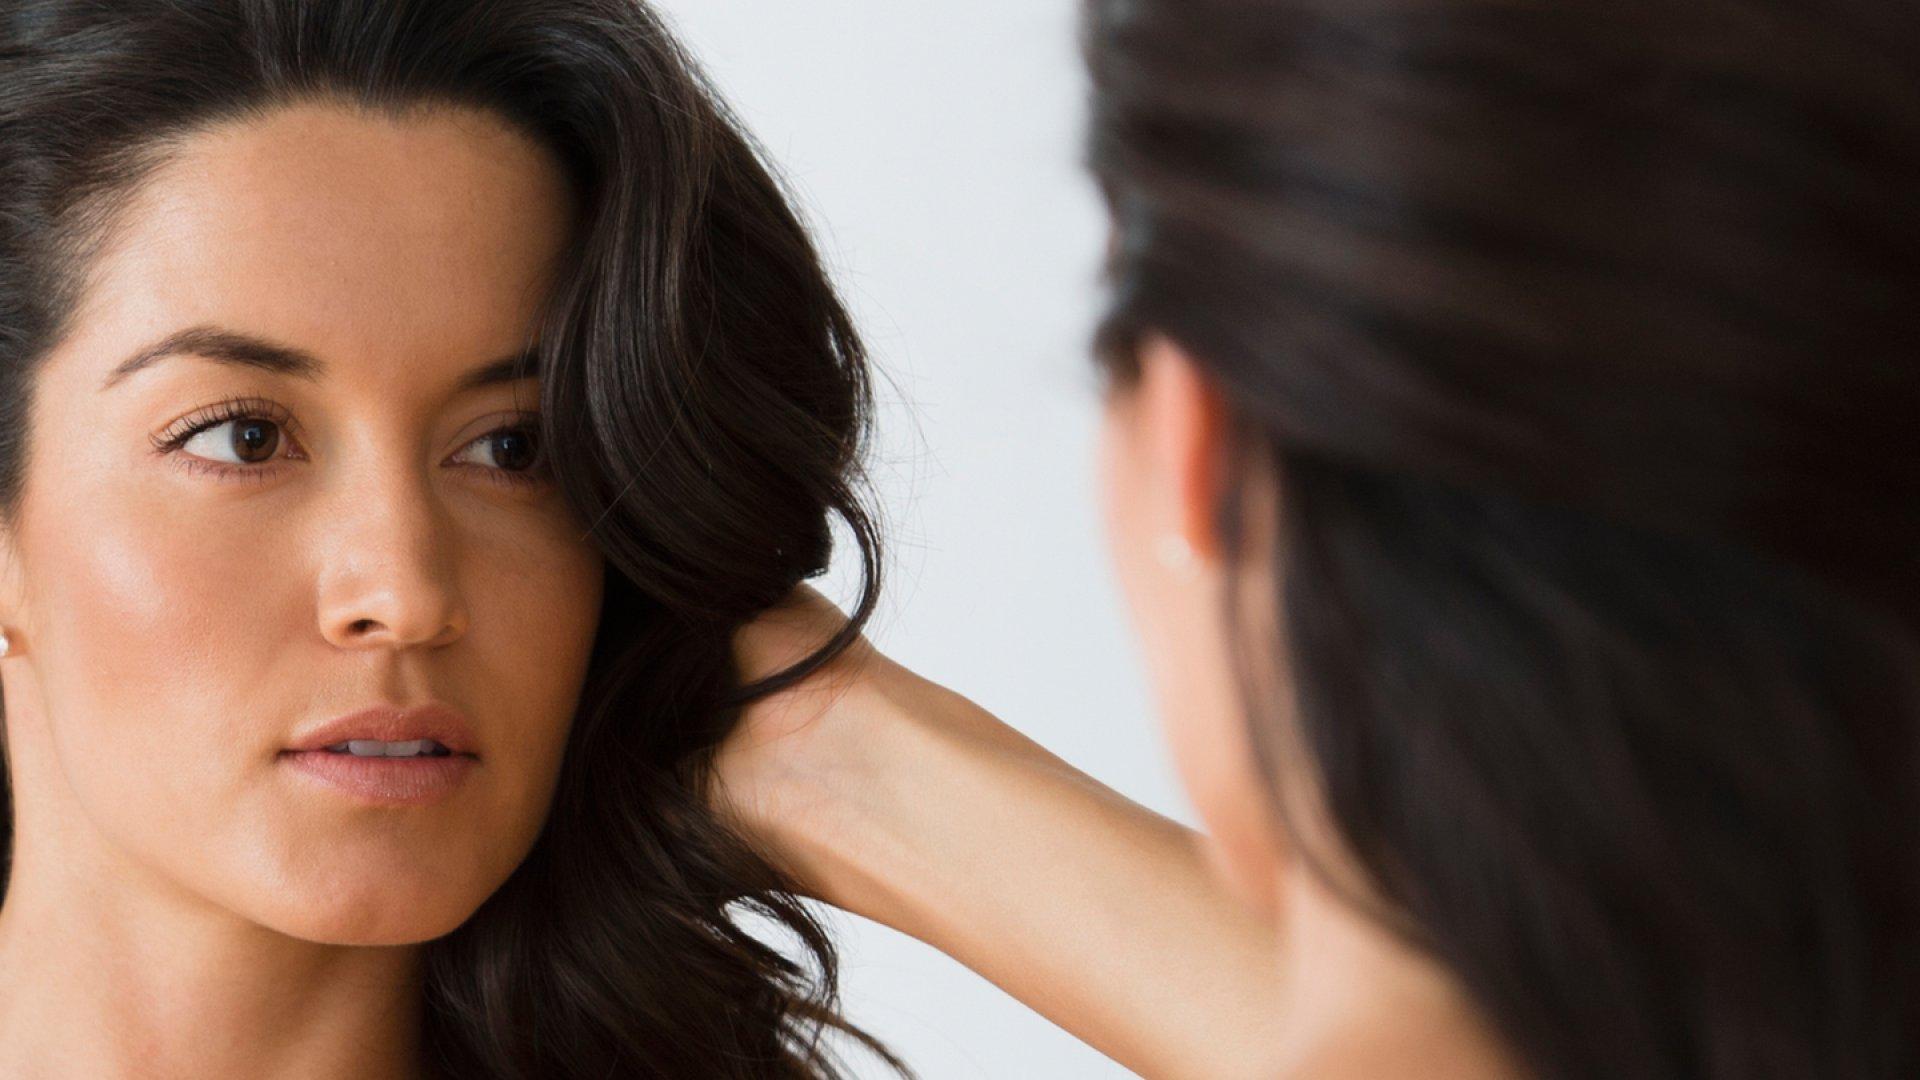 Why I Use Flirtation, Seduction & Feminine Intrigue in Business